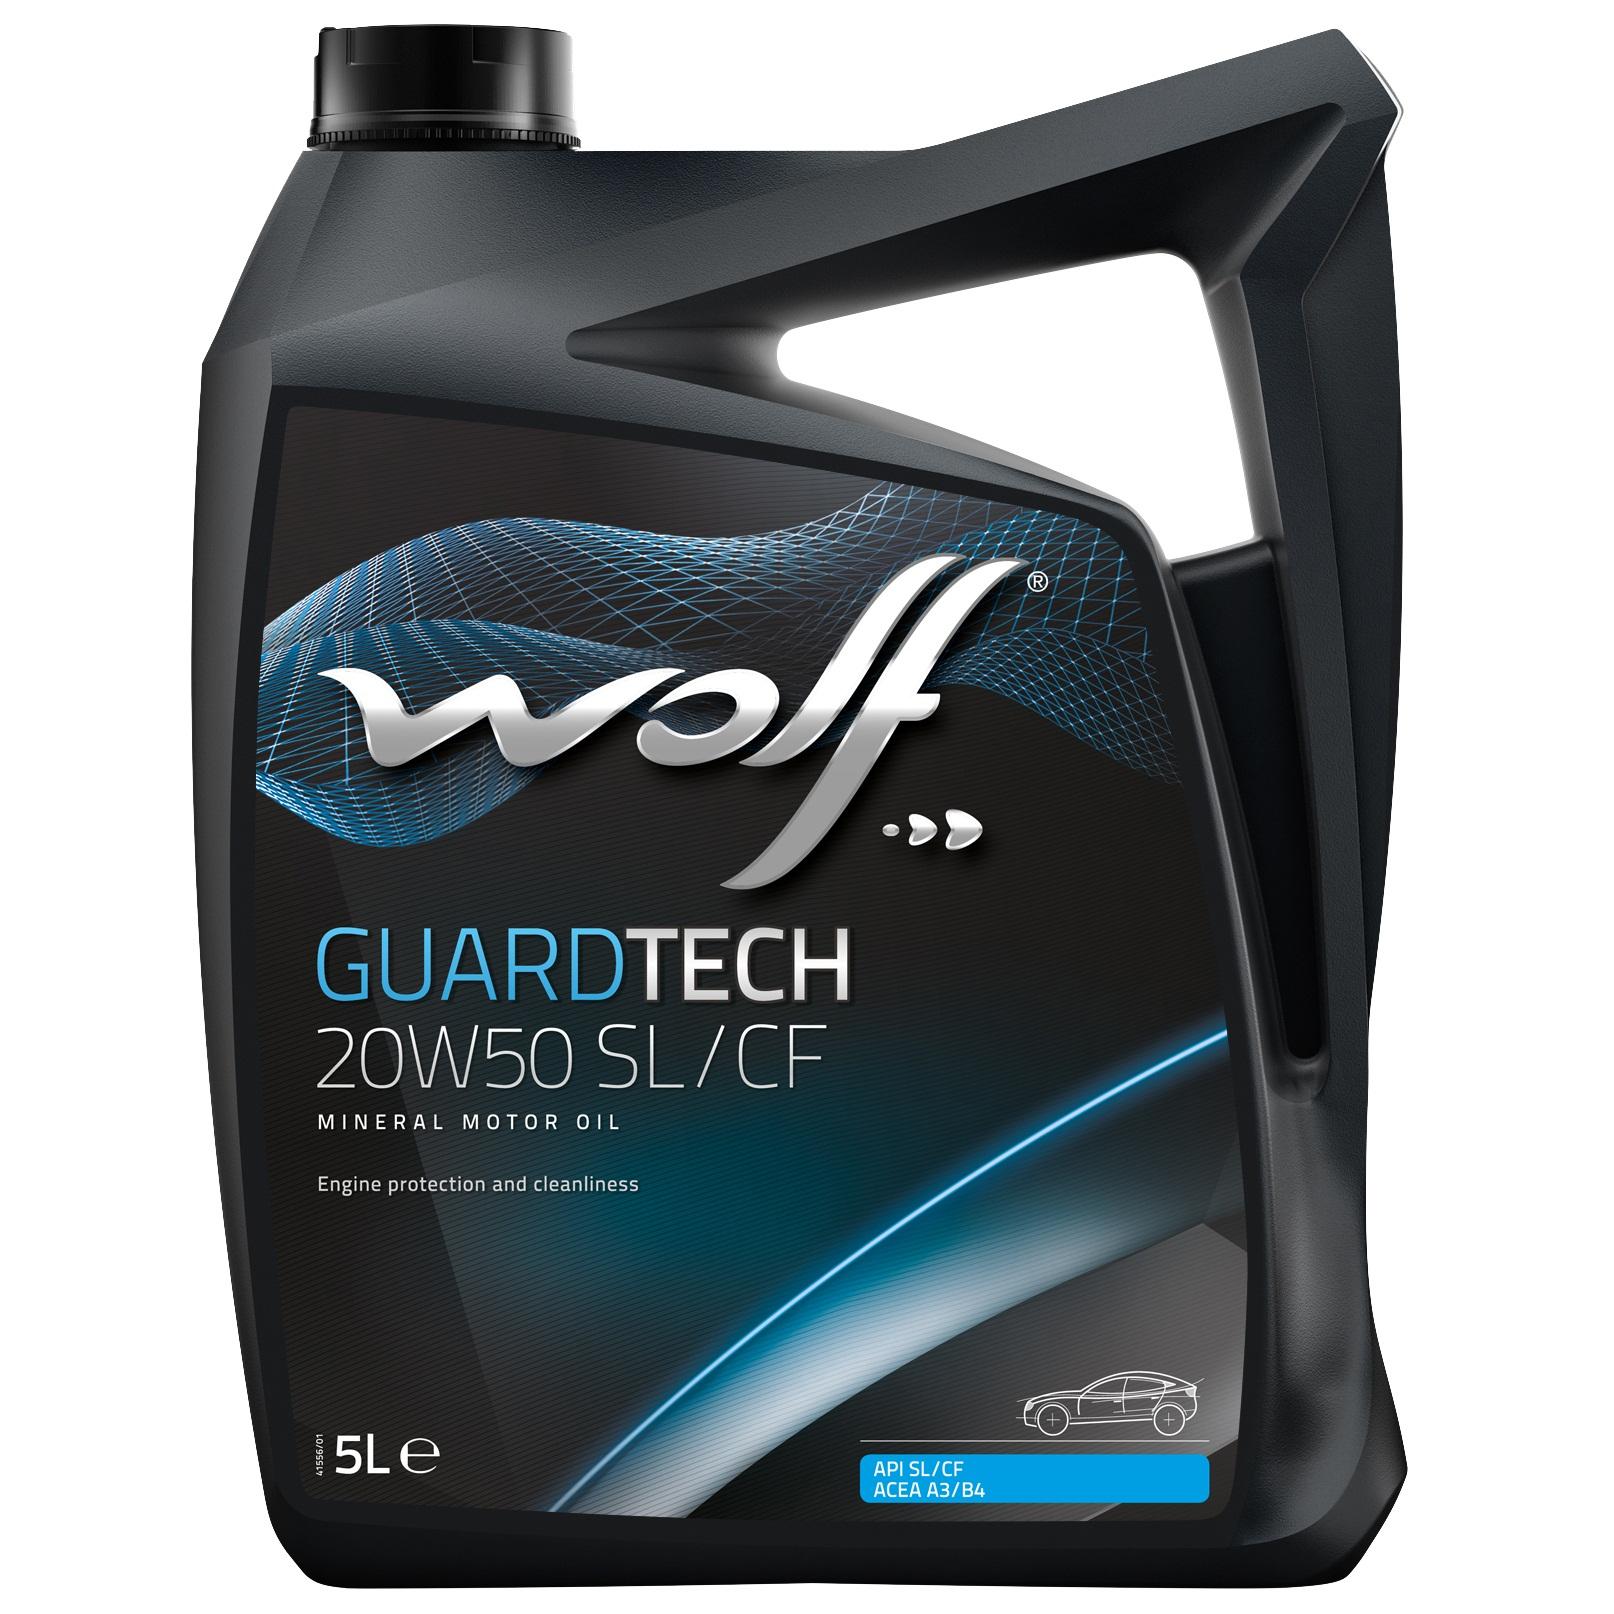 ULEI MOTOR WOLF GUARDTECH SL/CF 20W50 5L